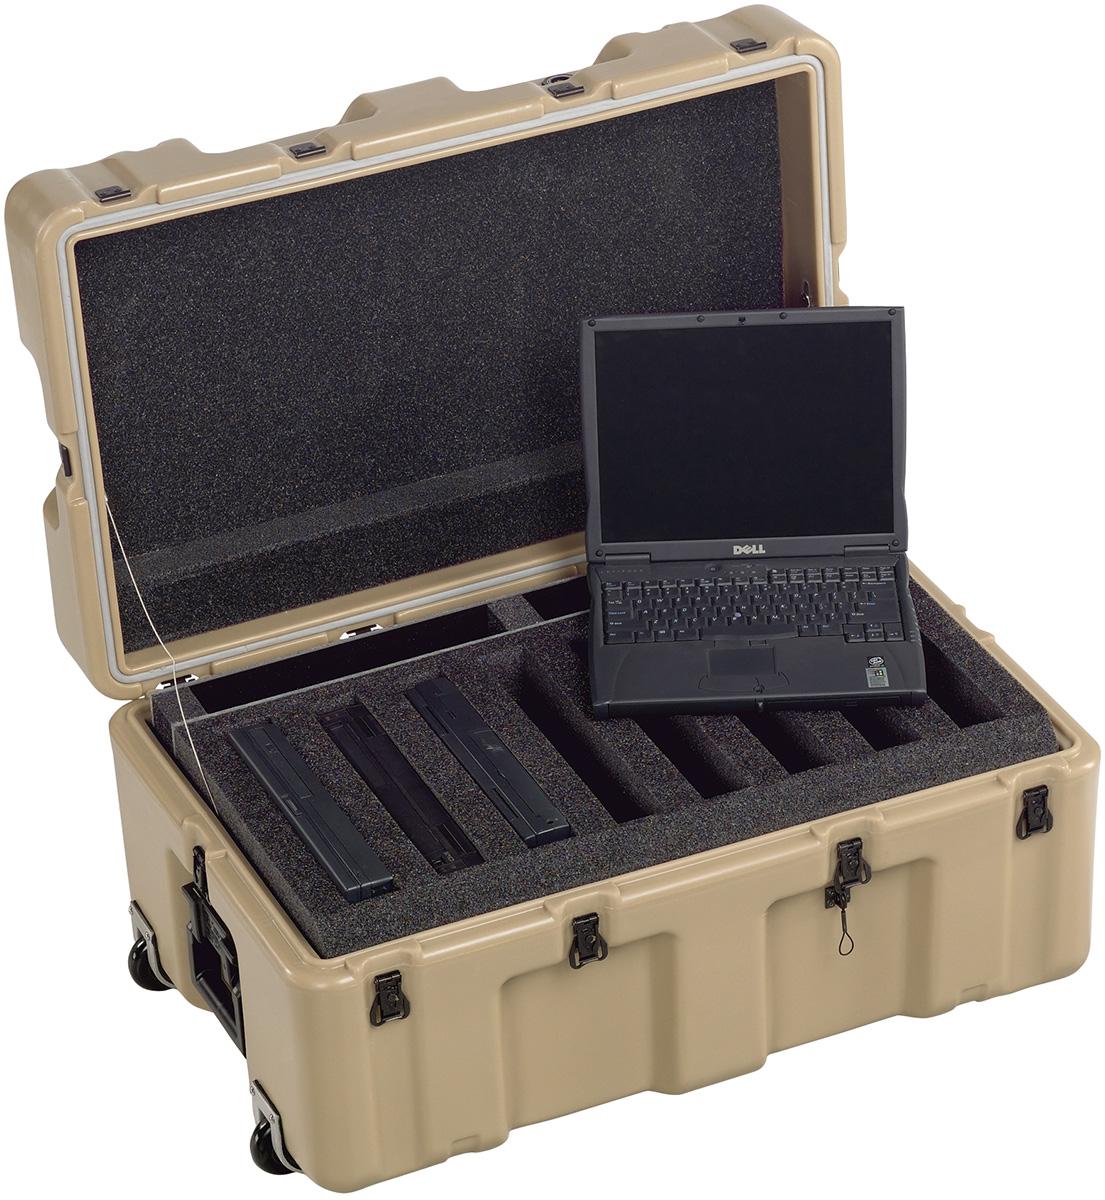 pelican military army laptop plastic case